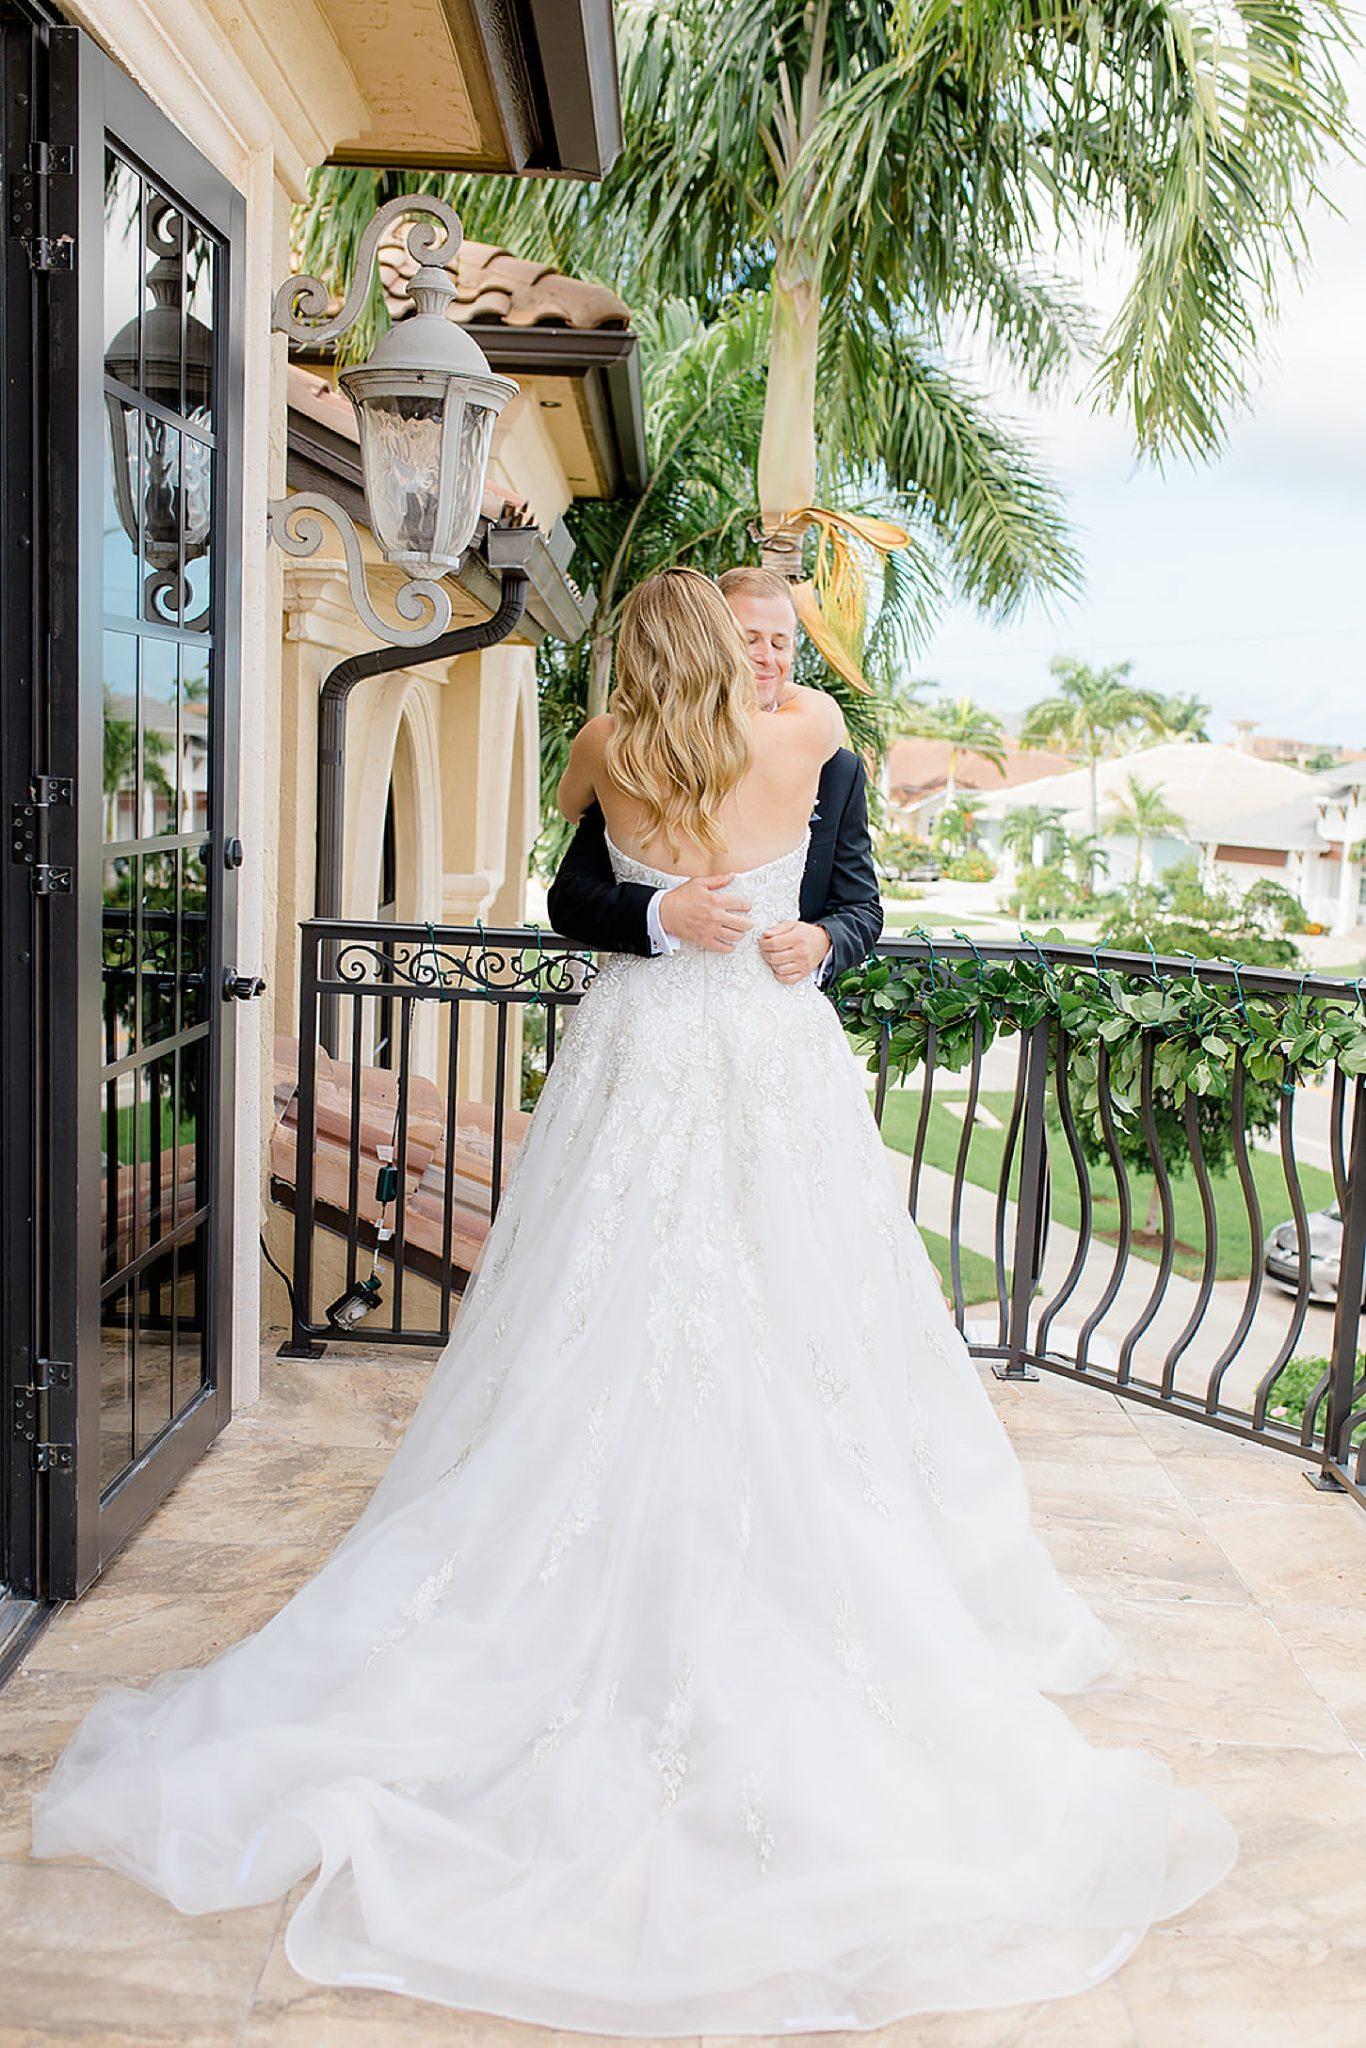 Marco Island Florida Wedding Photography by Magdalena Studios 0017 scaled